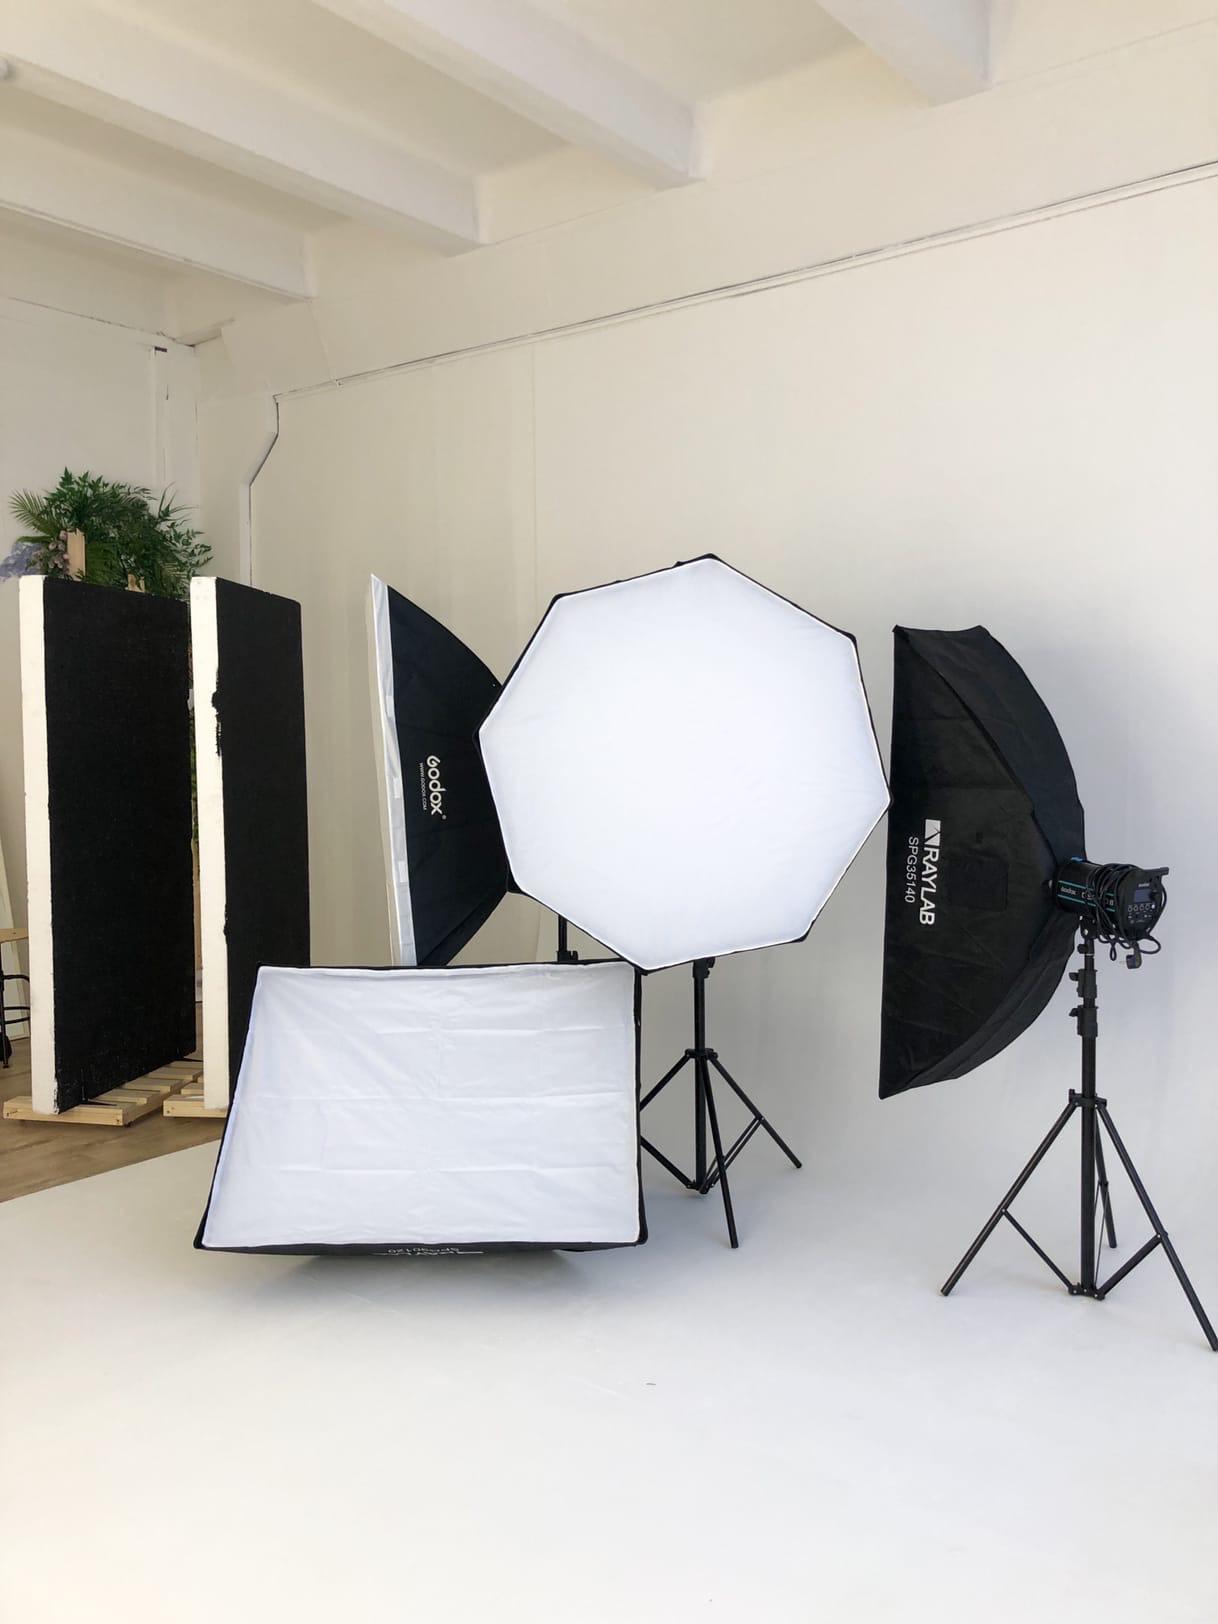 березка фотостудия владимир забор